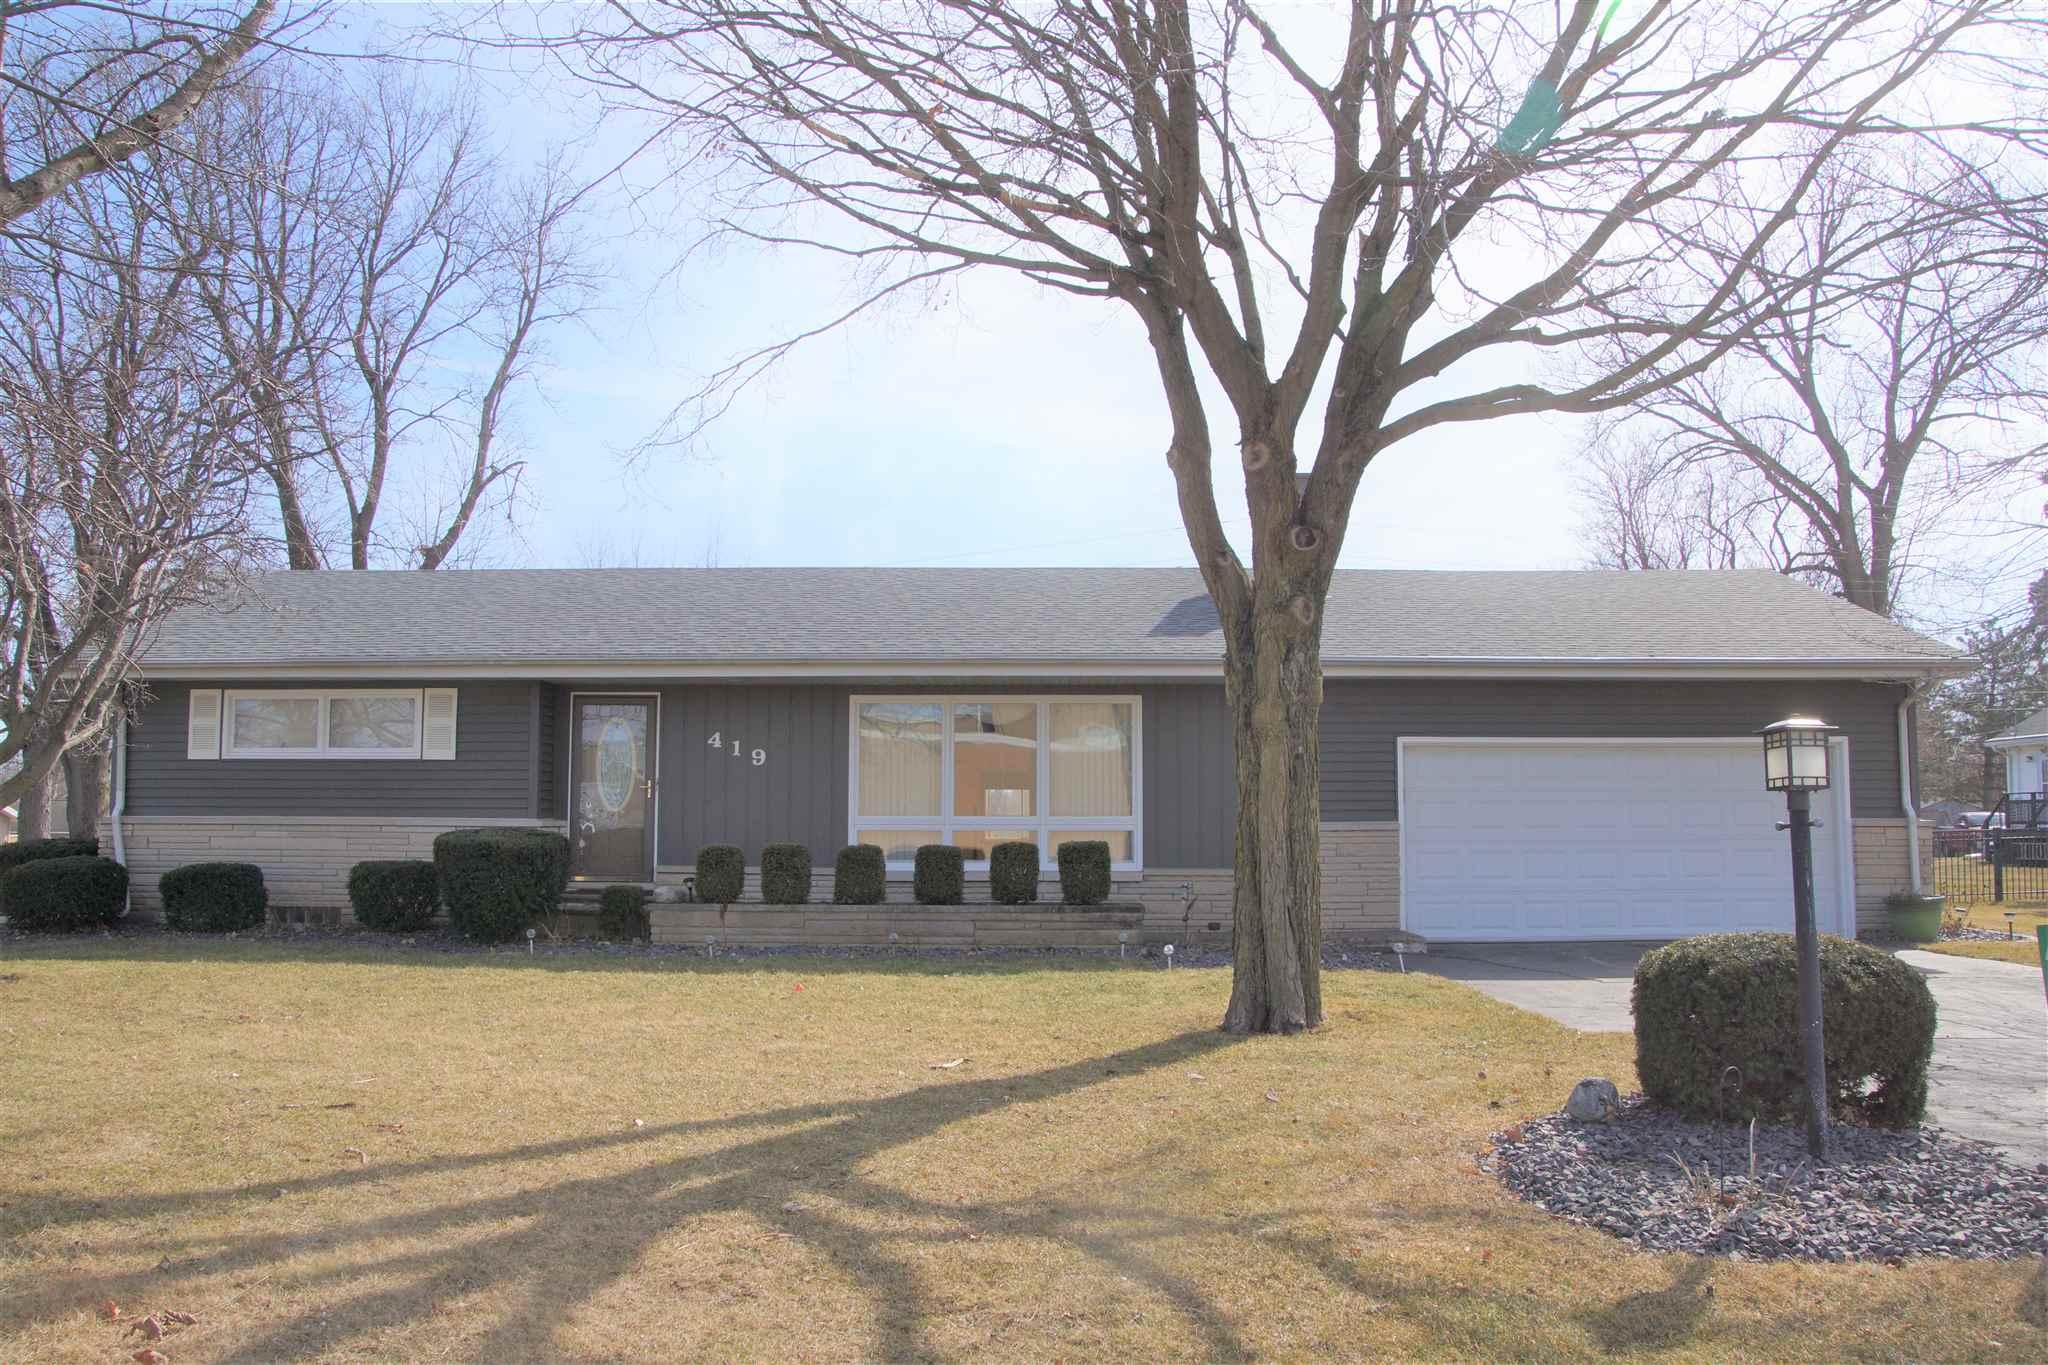 419 E EVANS Property Photo - Princeville, IL real estate listing